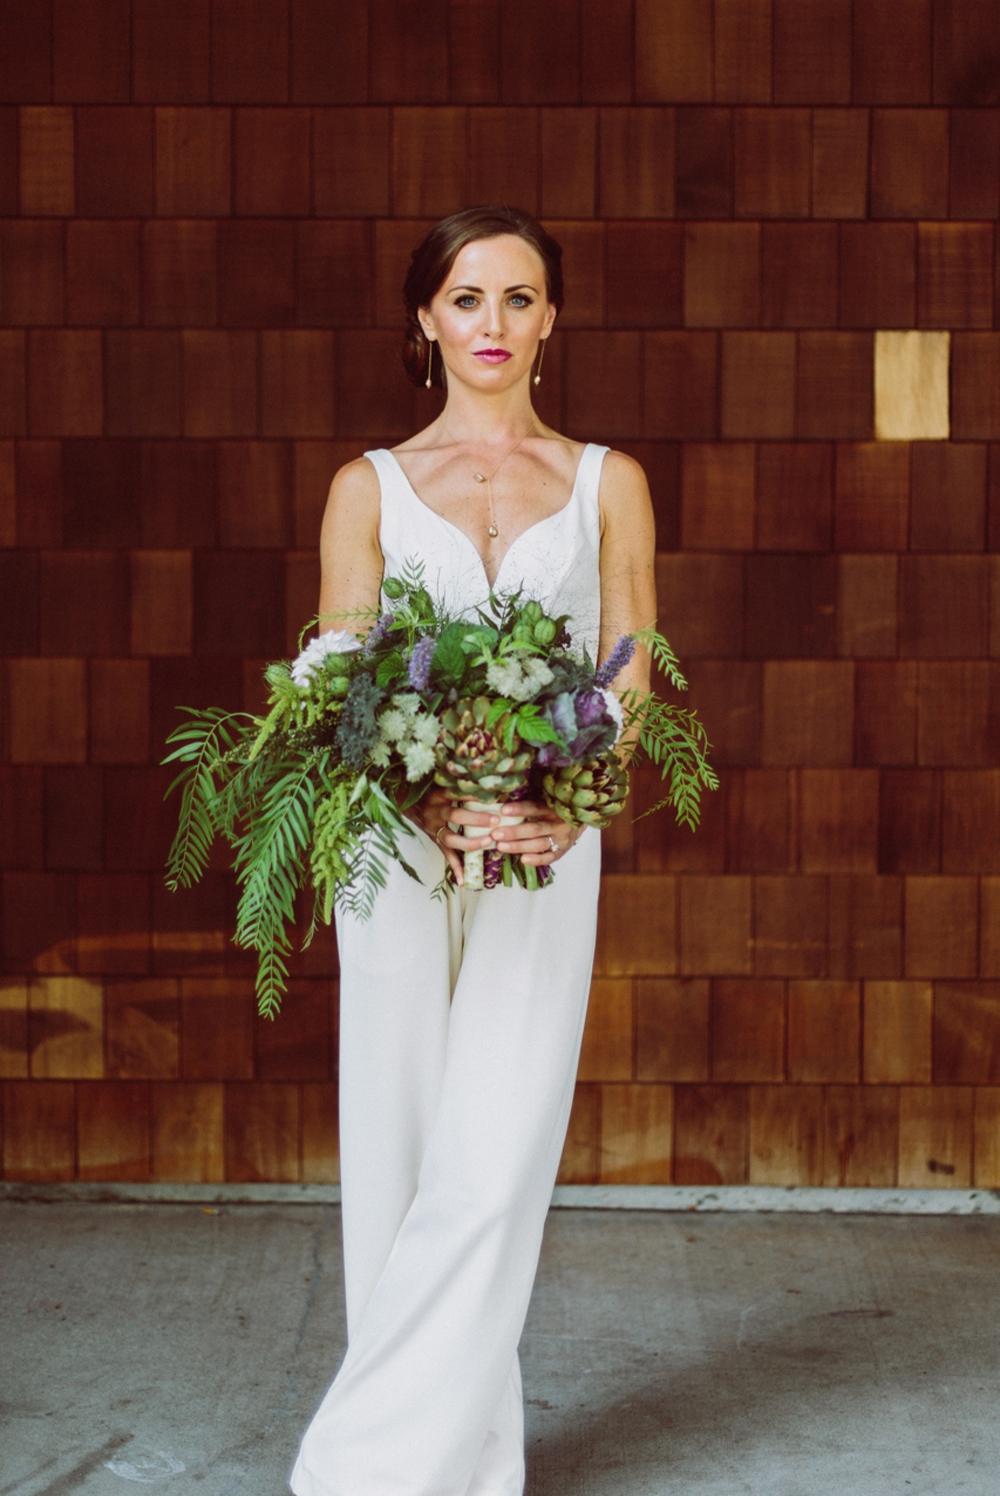 kale_themed_seattle_wedding_florist 3.jpg